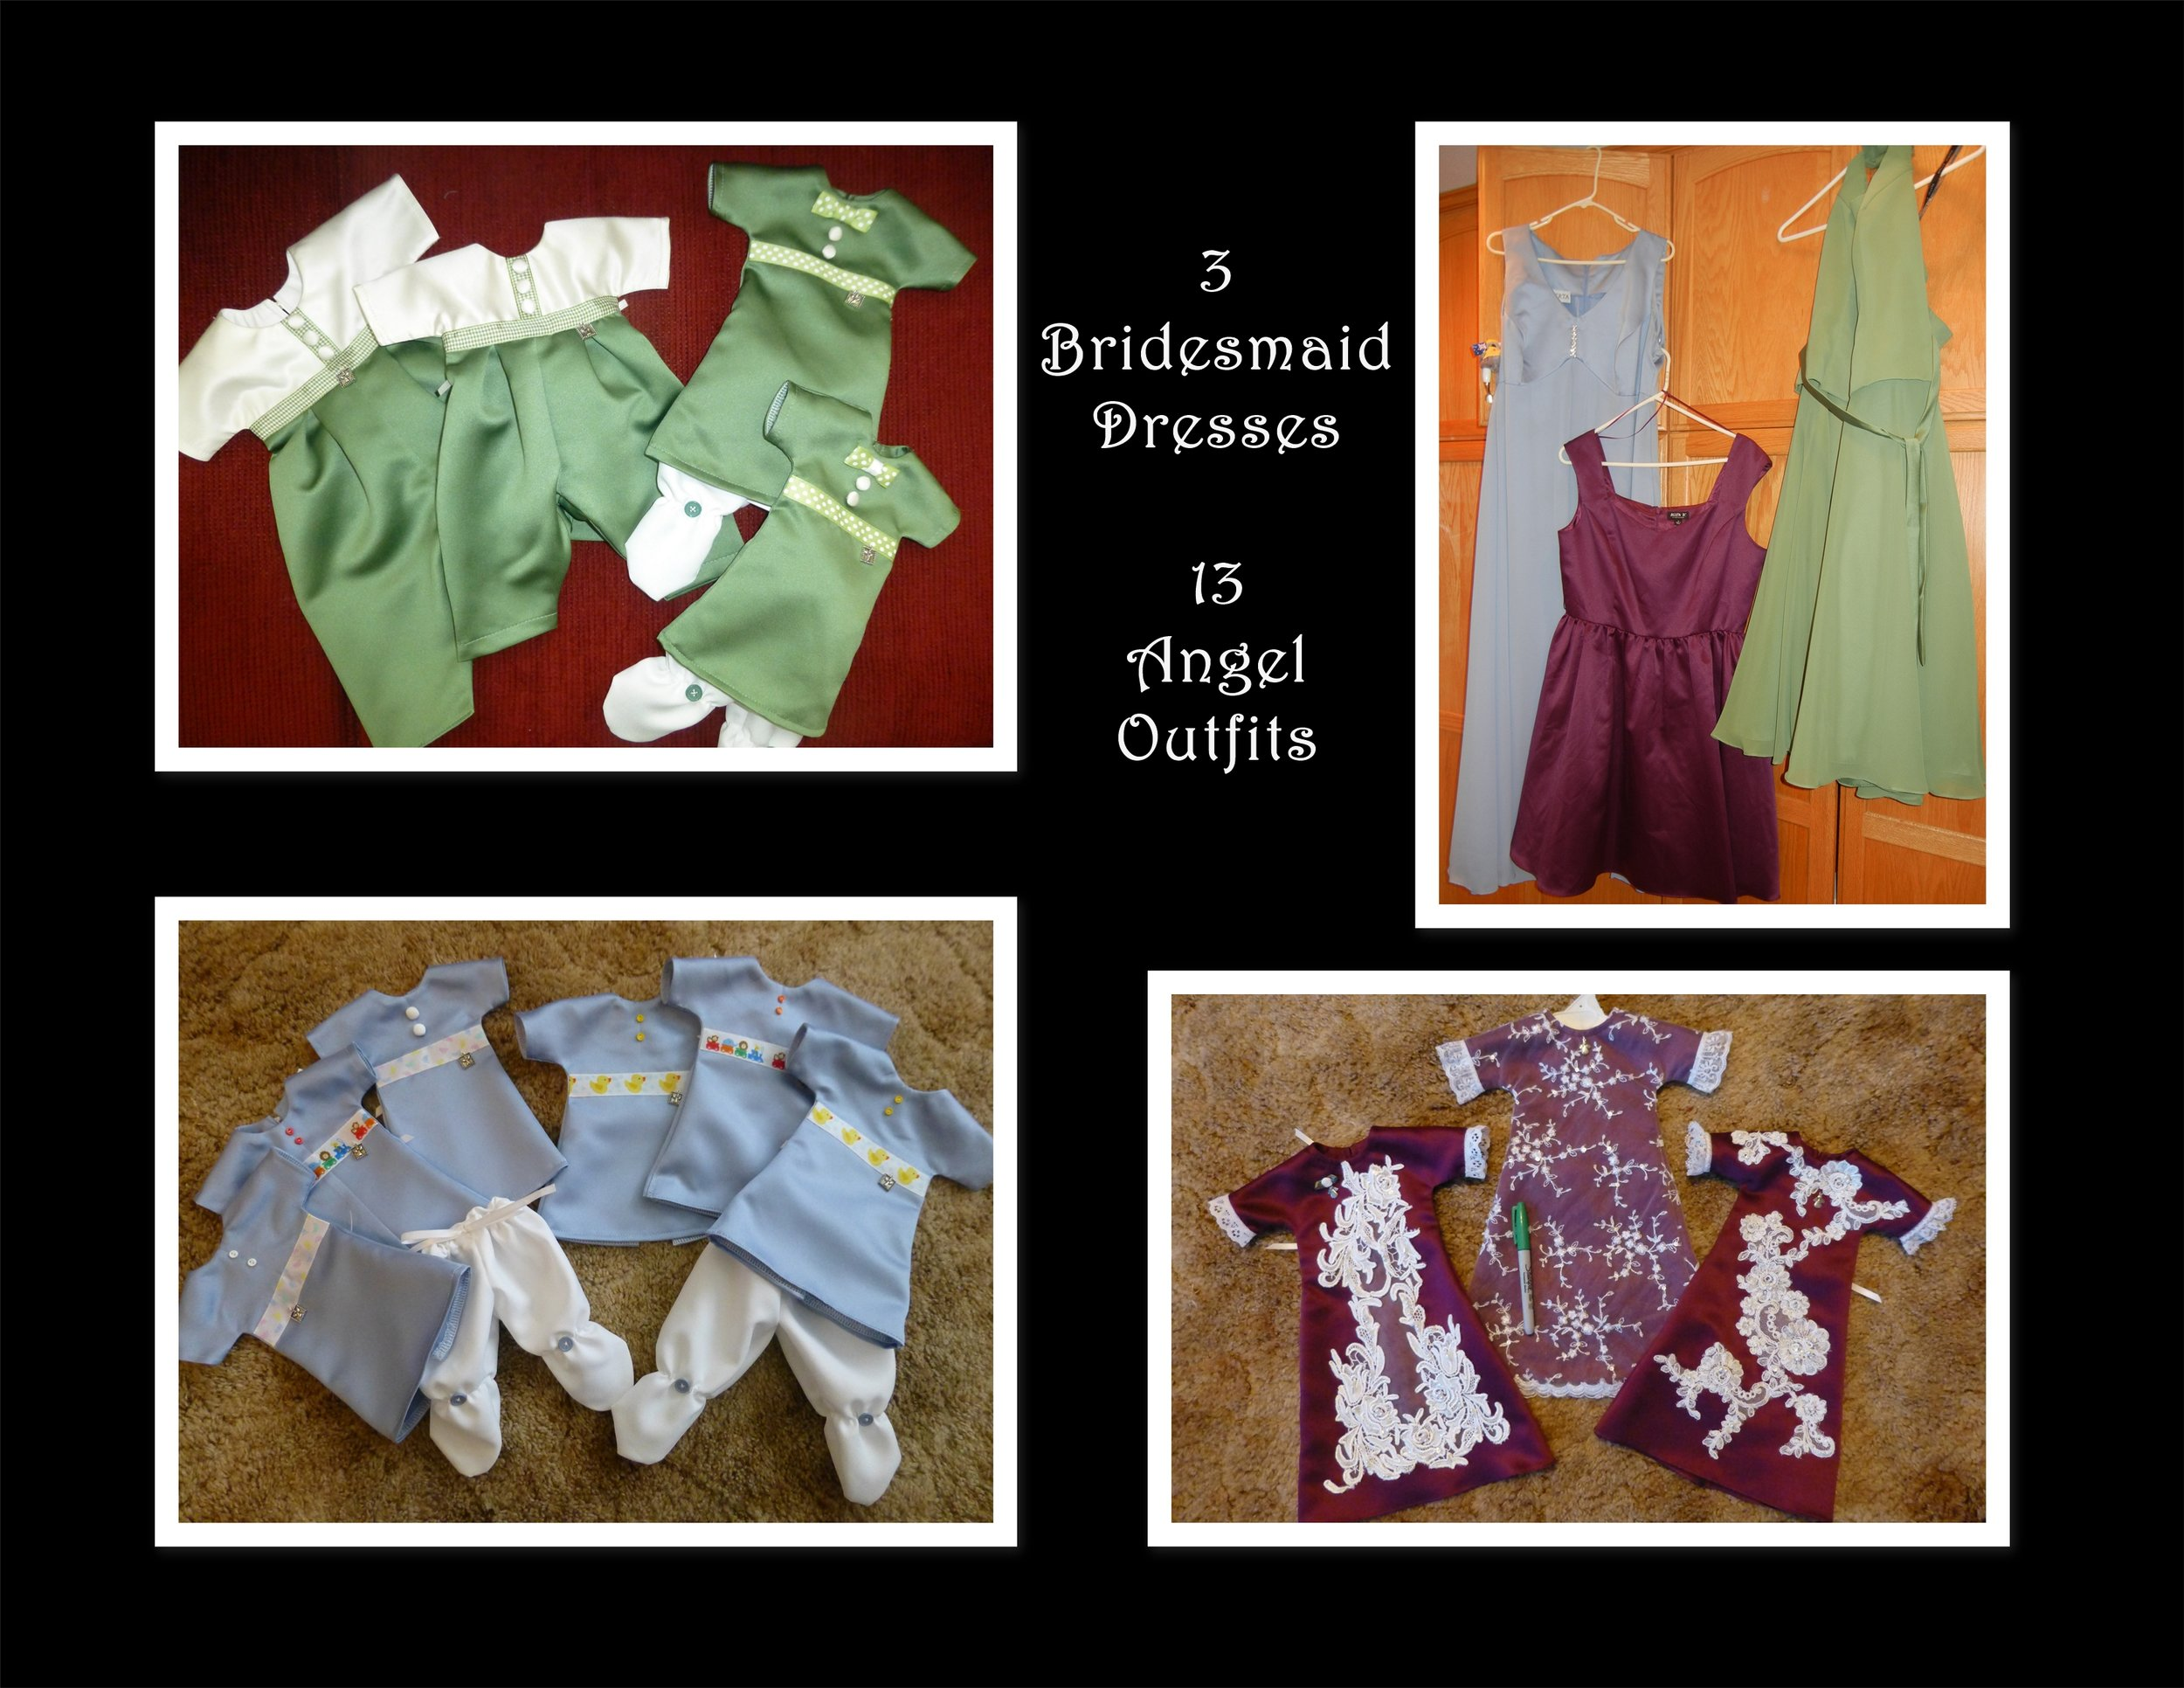 3 Bridesmaid Dresses.jpg